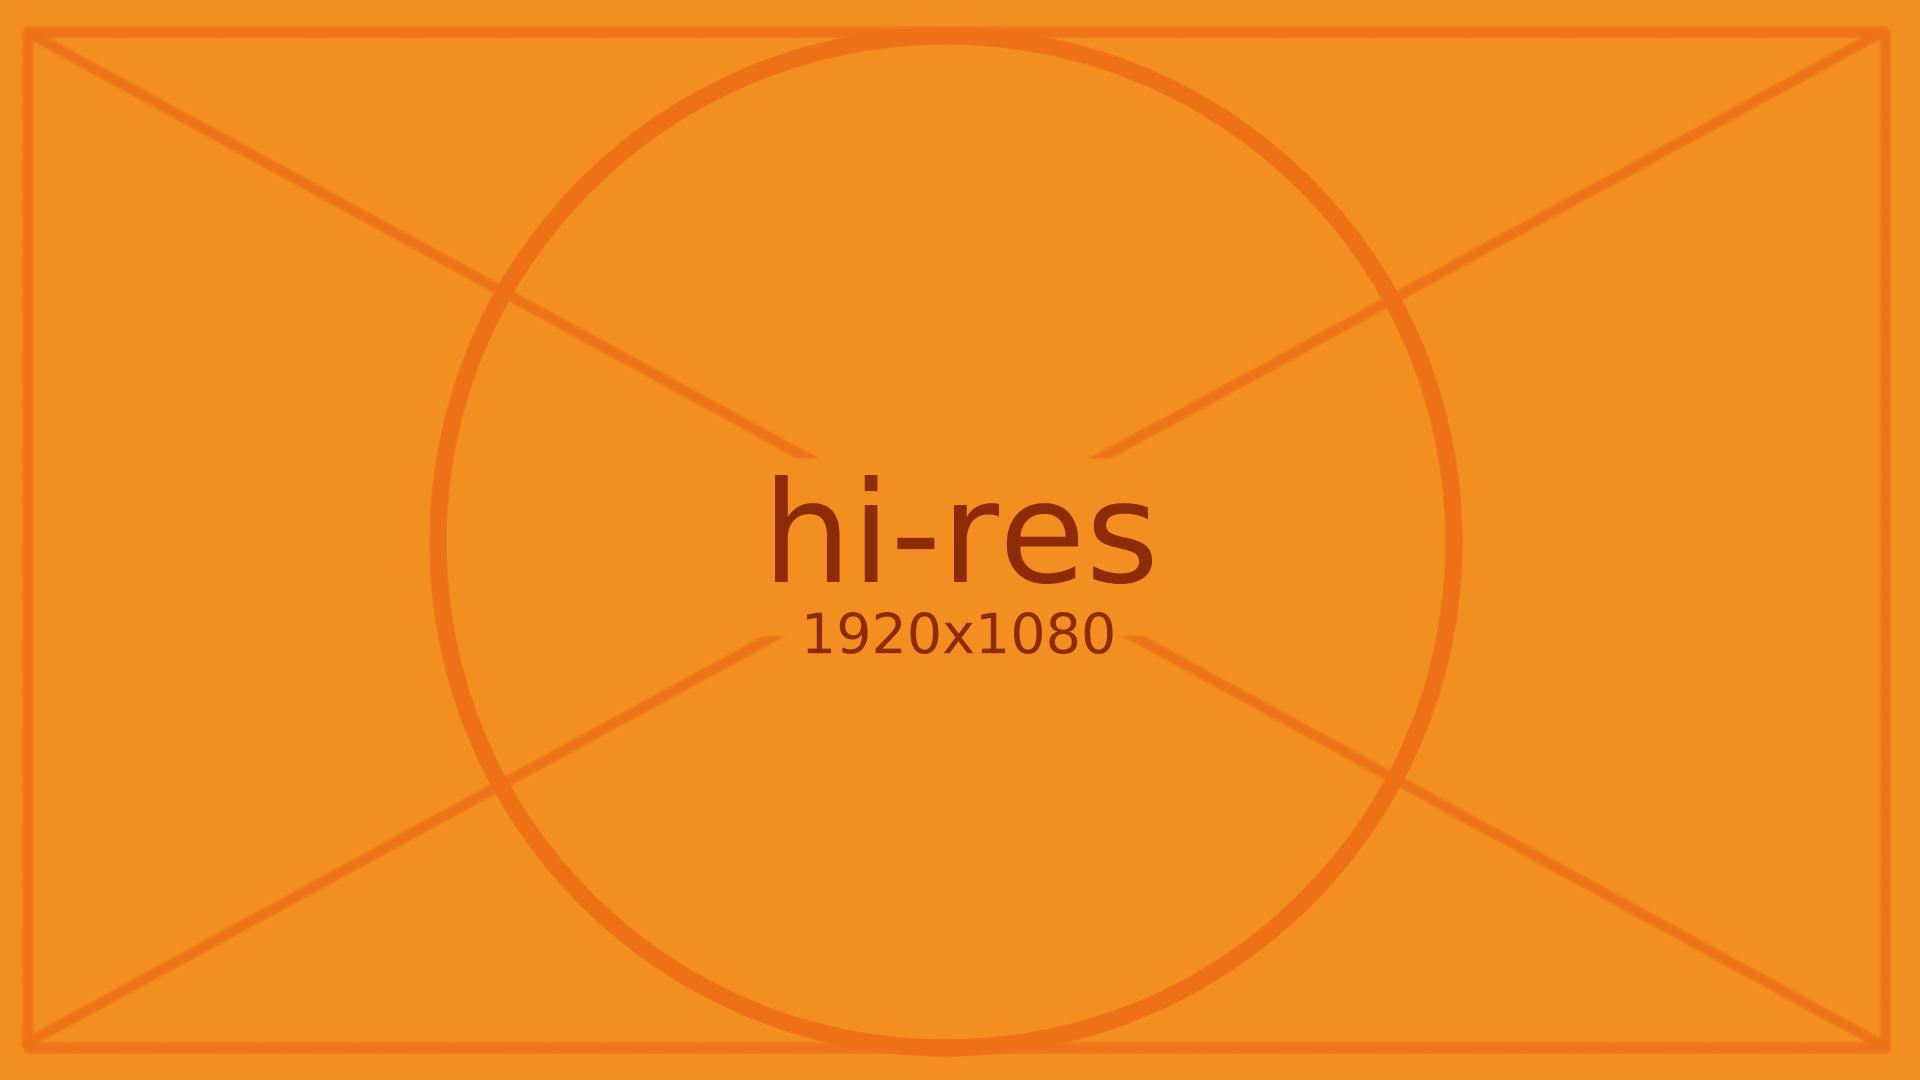 0_sources/0ther/artworks/hi-res/2015-03-01_orange-happy-parrot_by-عبد الملك.jpg